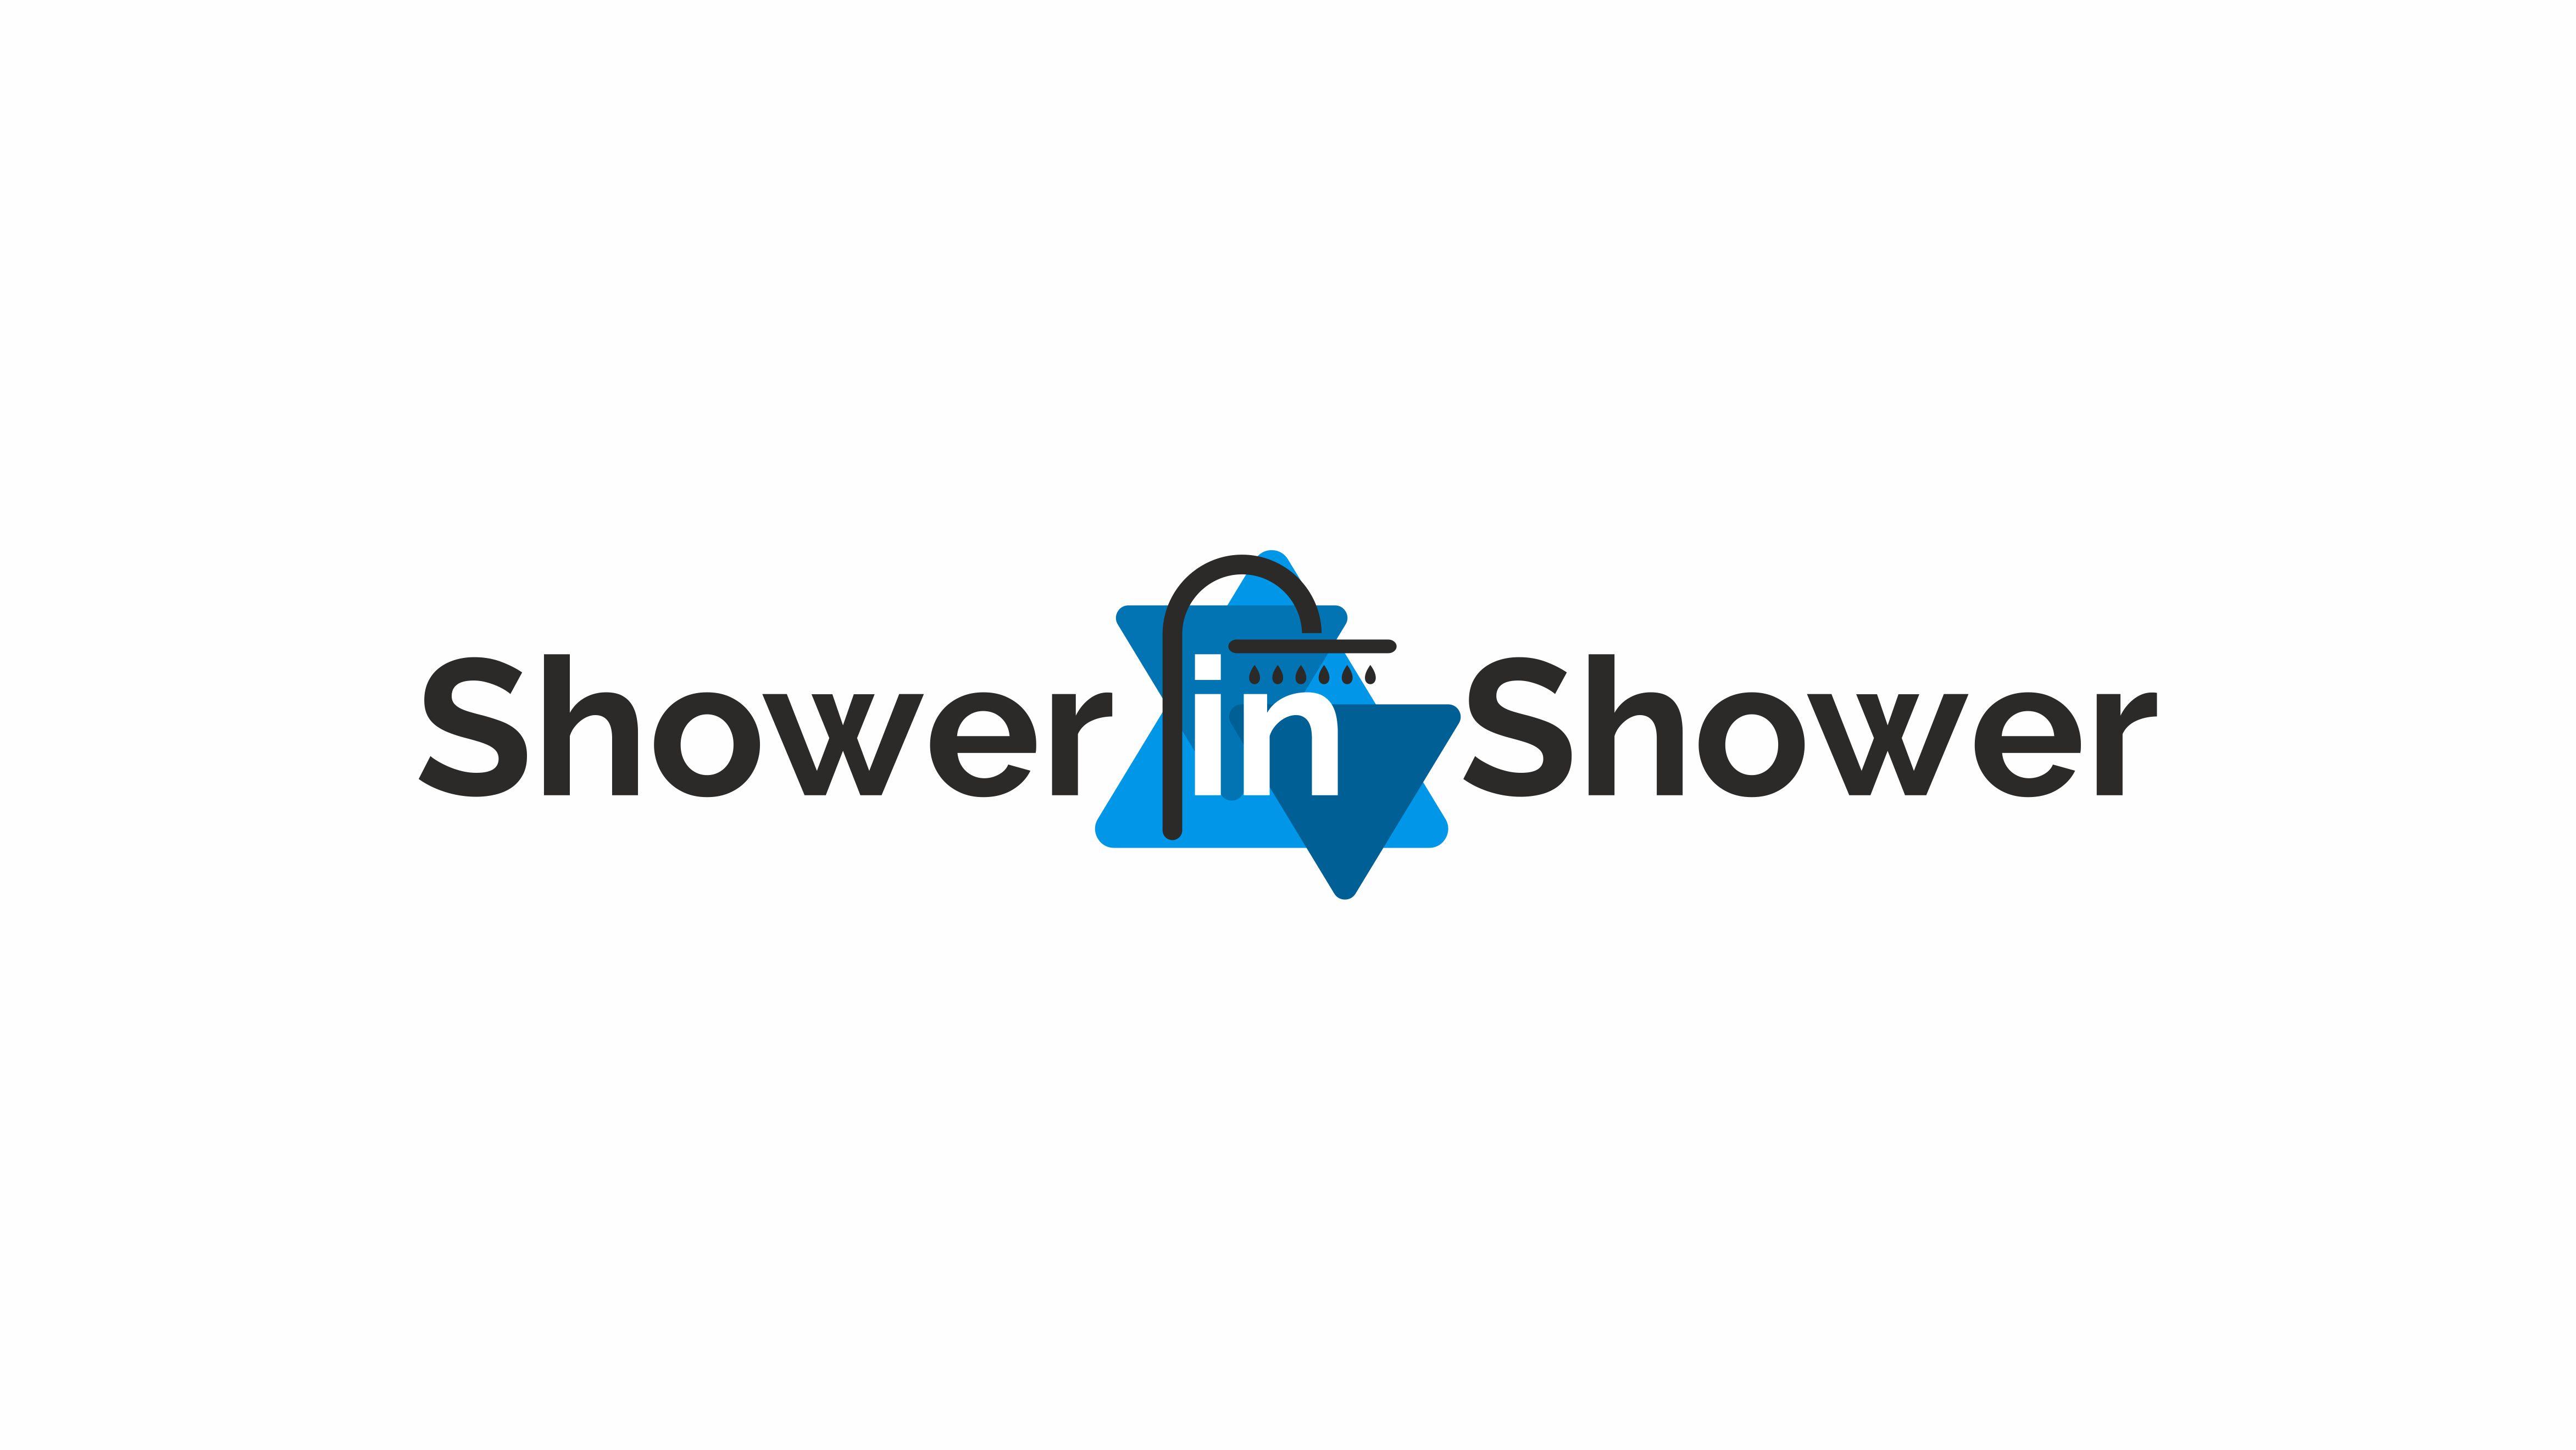 Showerinshower